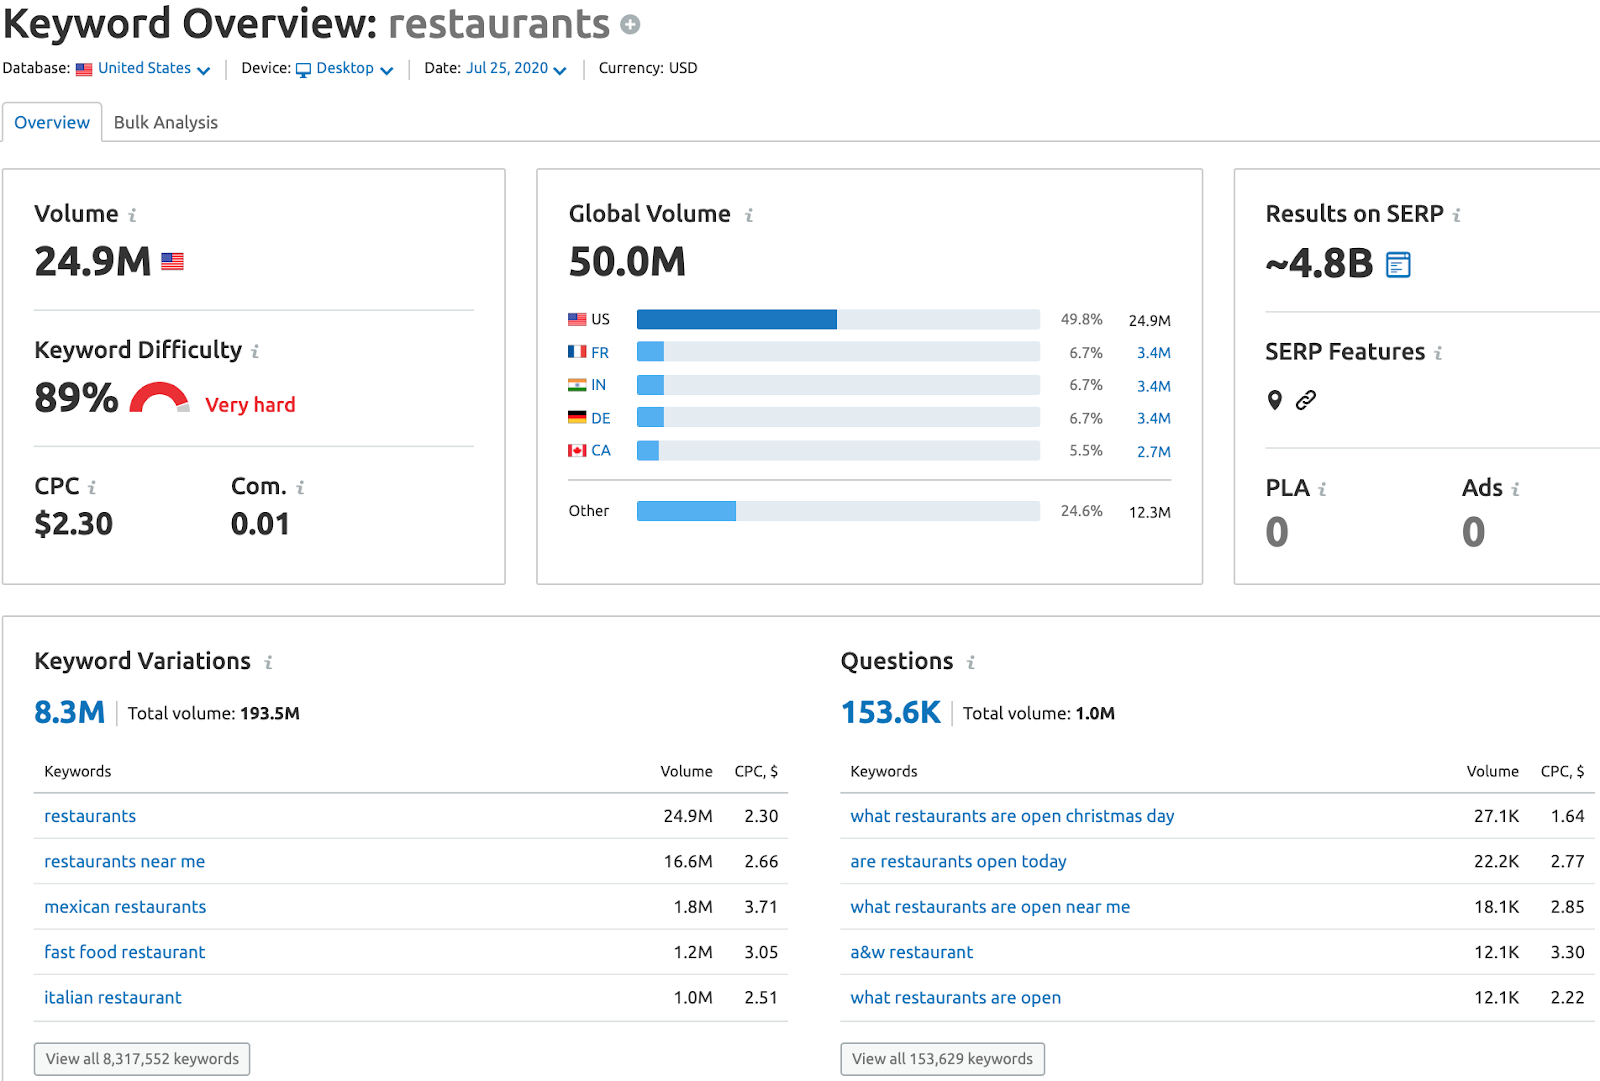 Restaurants Keyword Overview